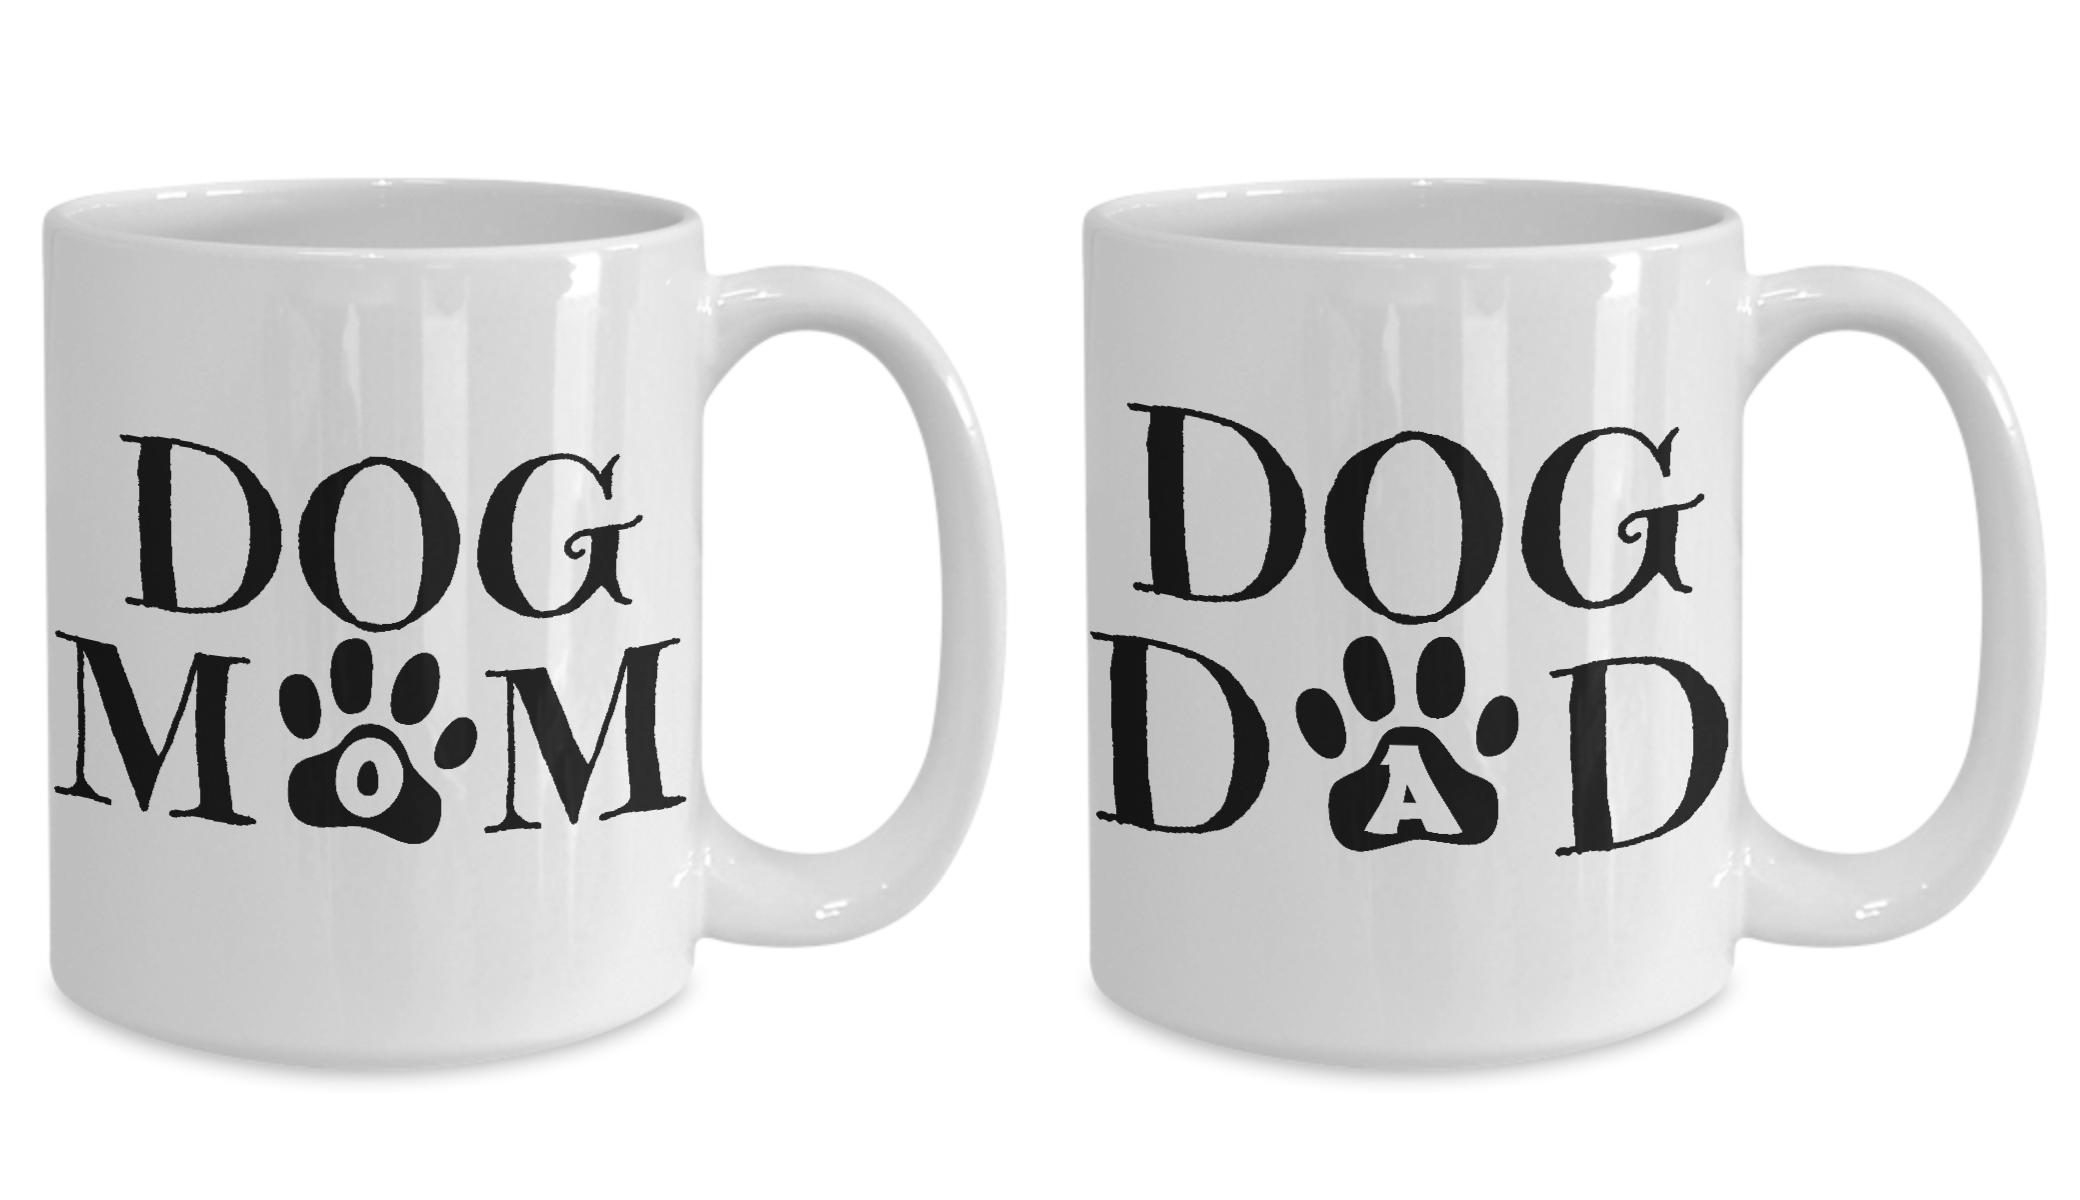 Dog Mom and Dad Matching Mug Set (With images) Mugs set